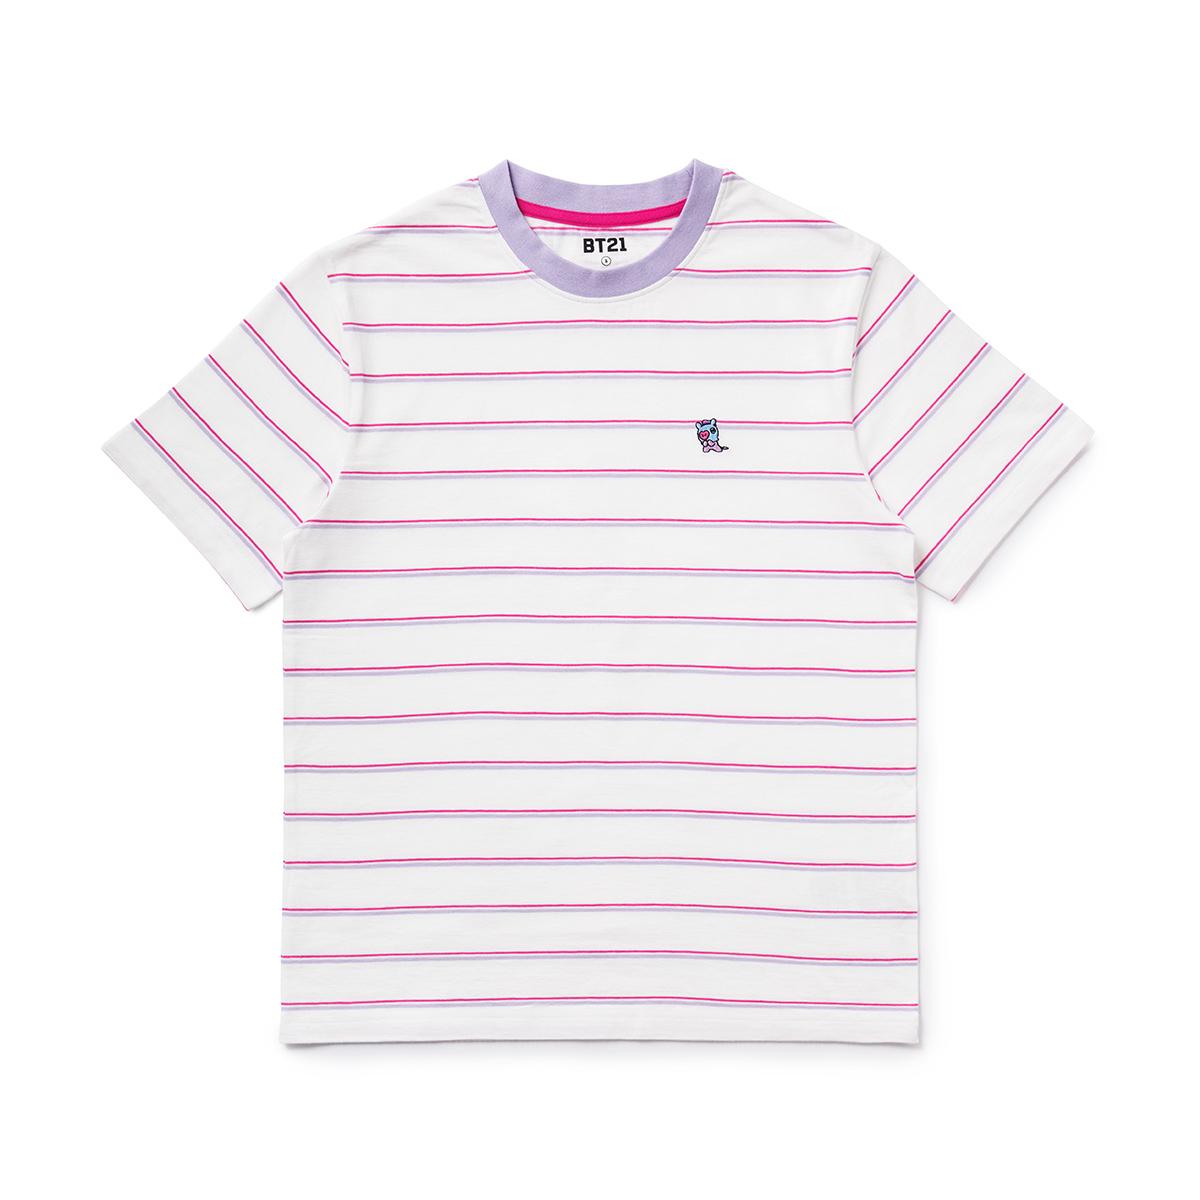 BT21 MANG 베이직 스트라이프 반팔 티셔츠